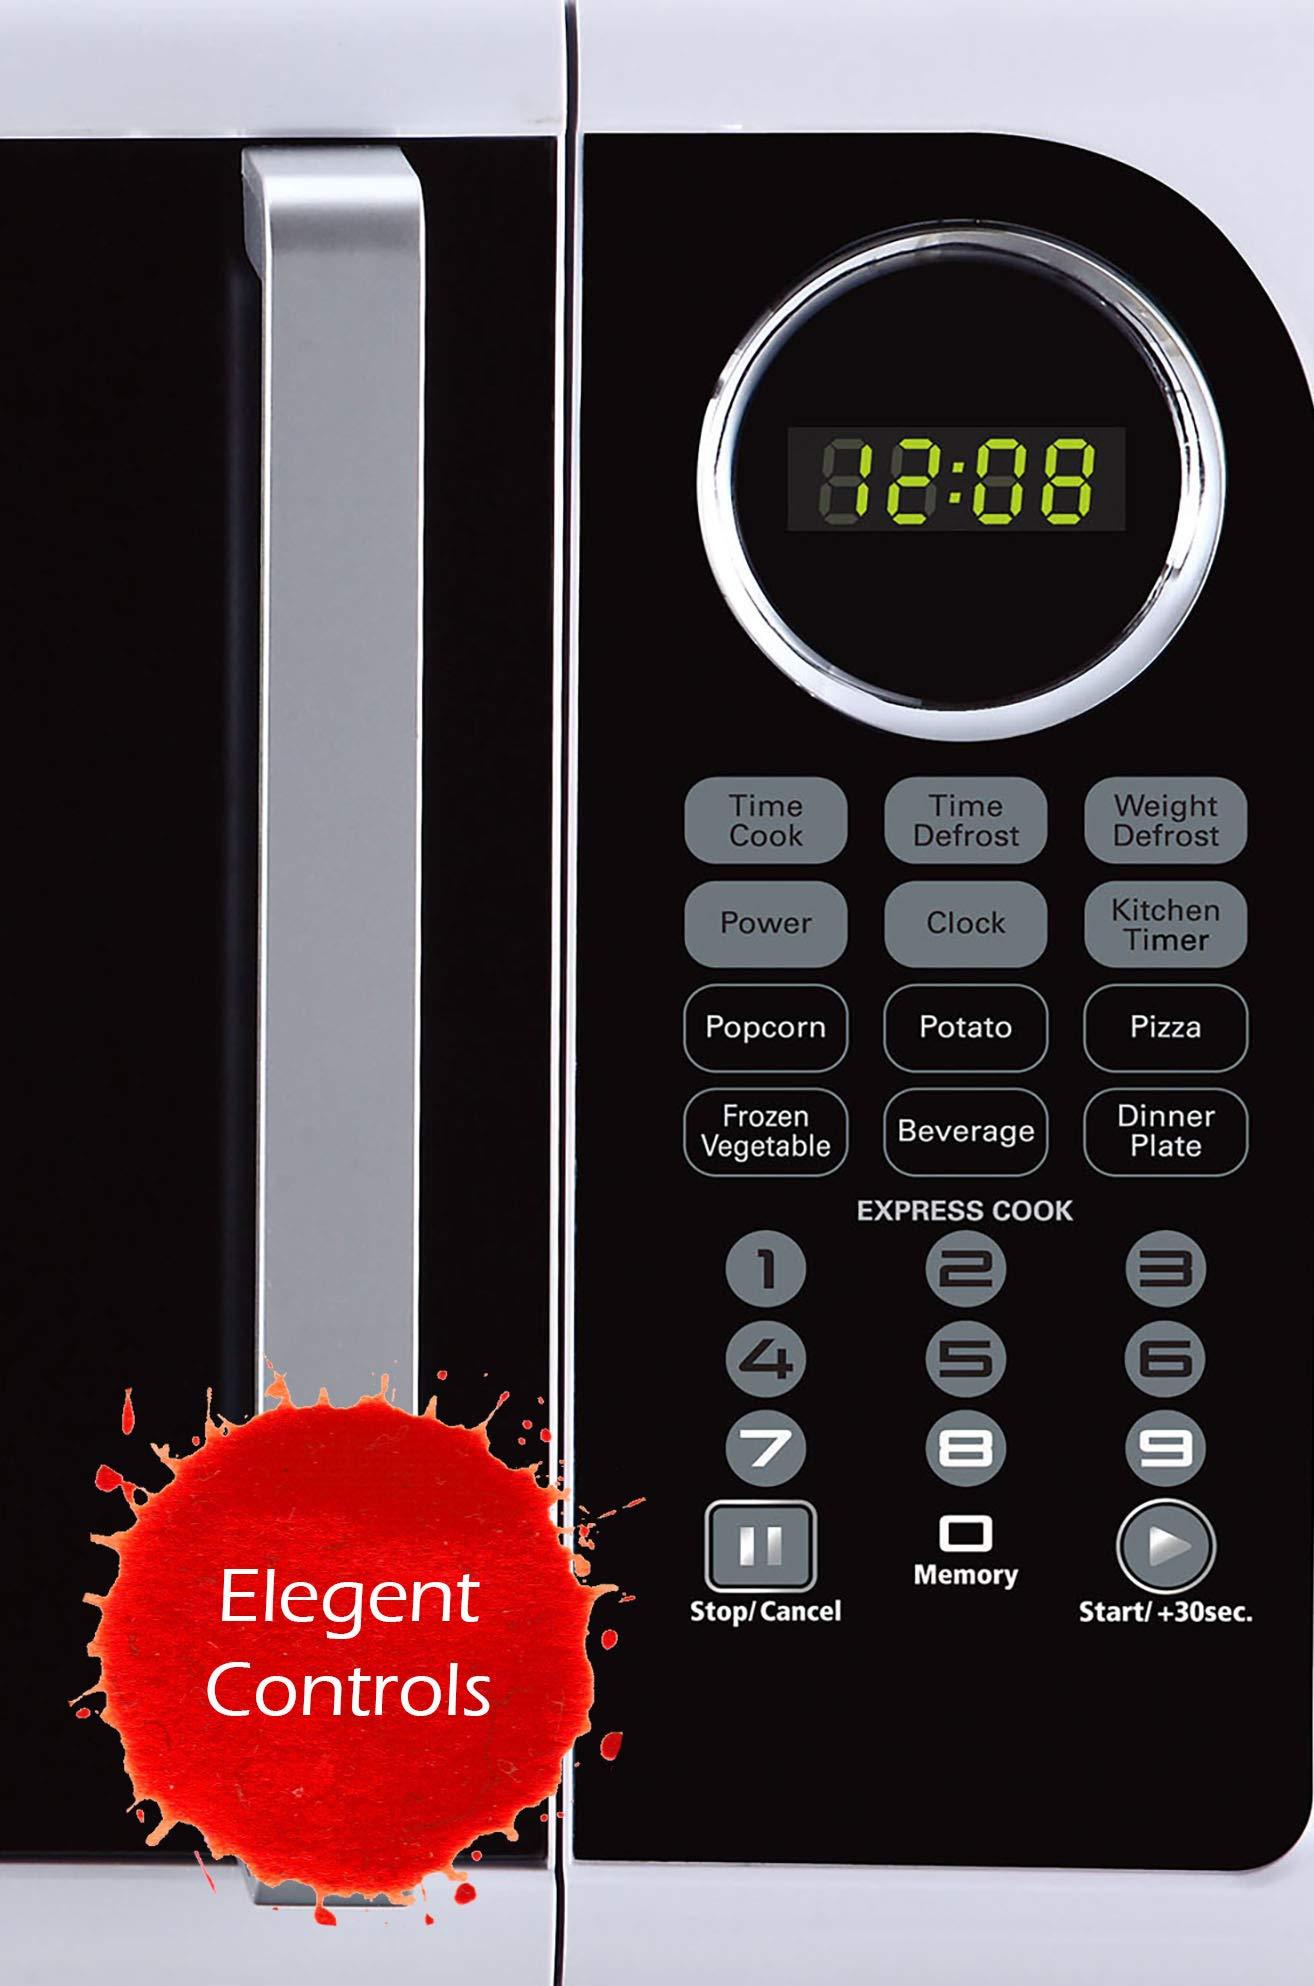 Black+Decker EM925ACP-P1 0.9 Cu. Ft. Digital Microwave, White by BLACK+DECKER (Image #5)